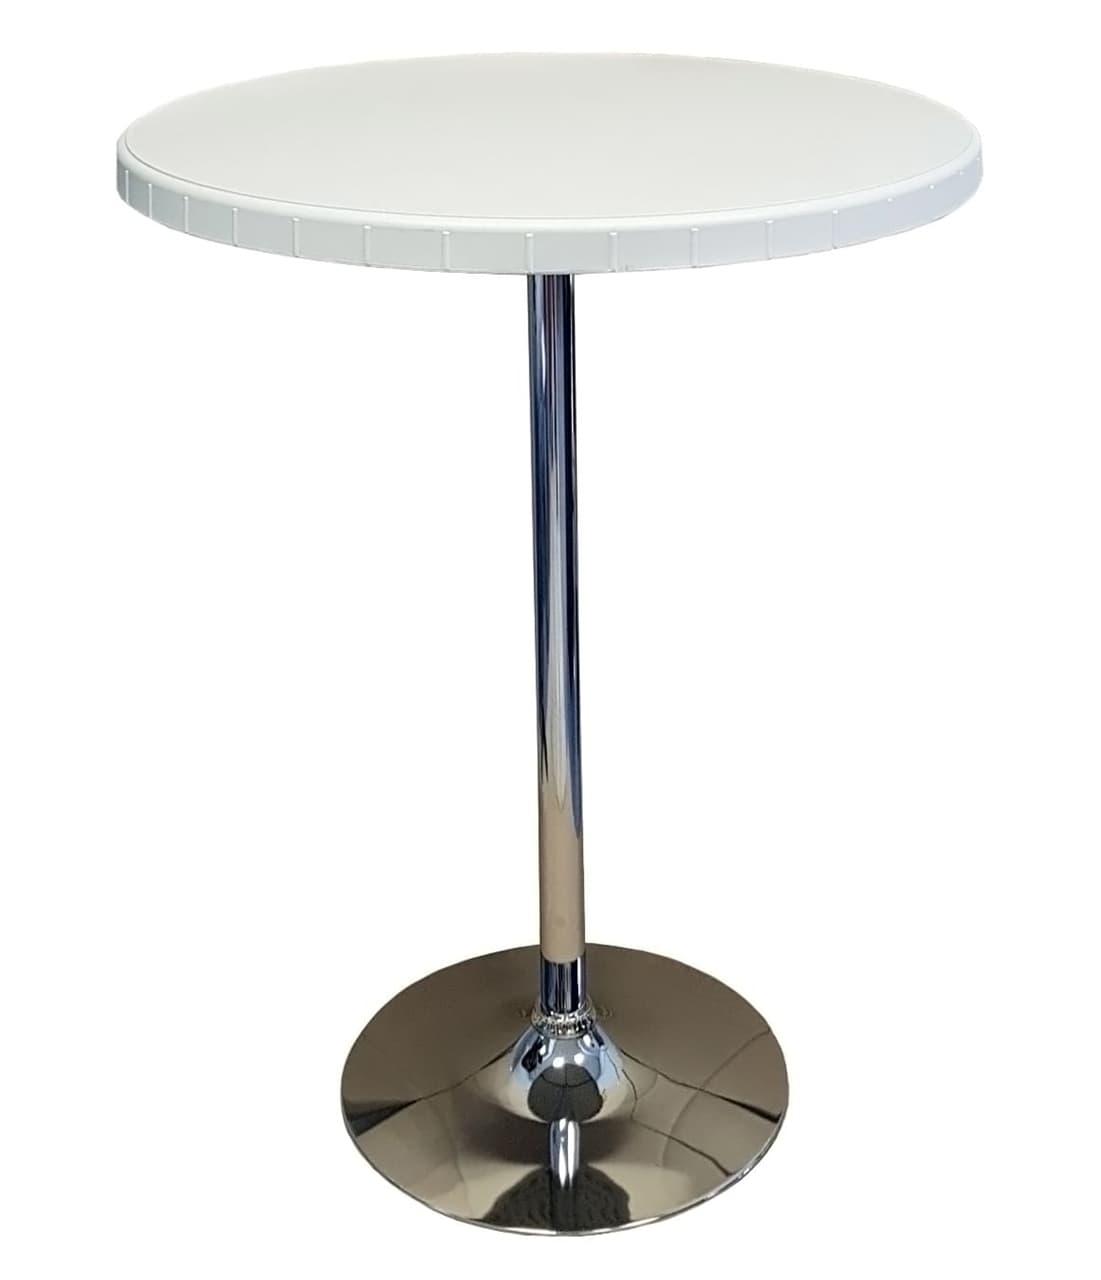 Стол барный разборный 80/110, HDPE пластик, металл.коркас - фото 7798